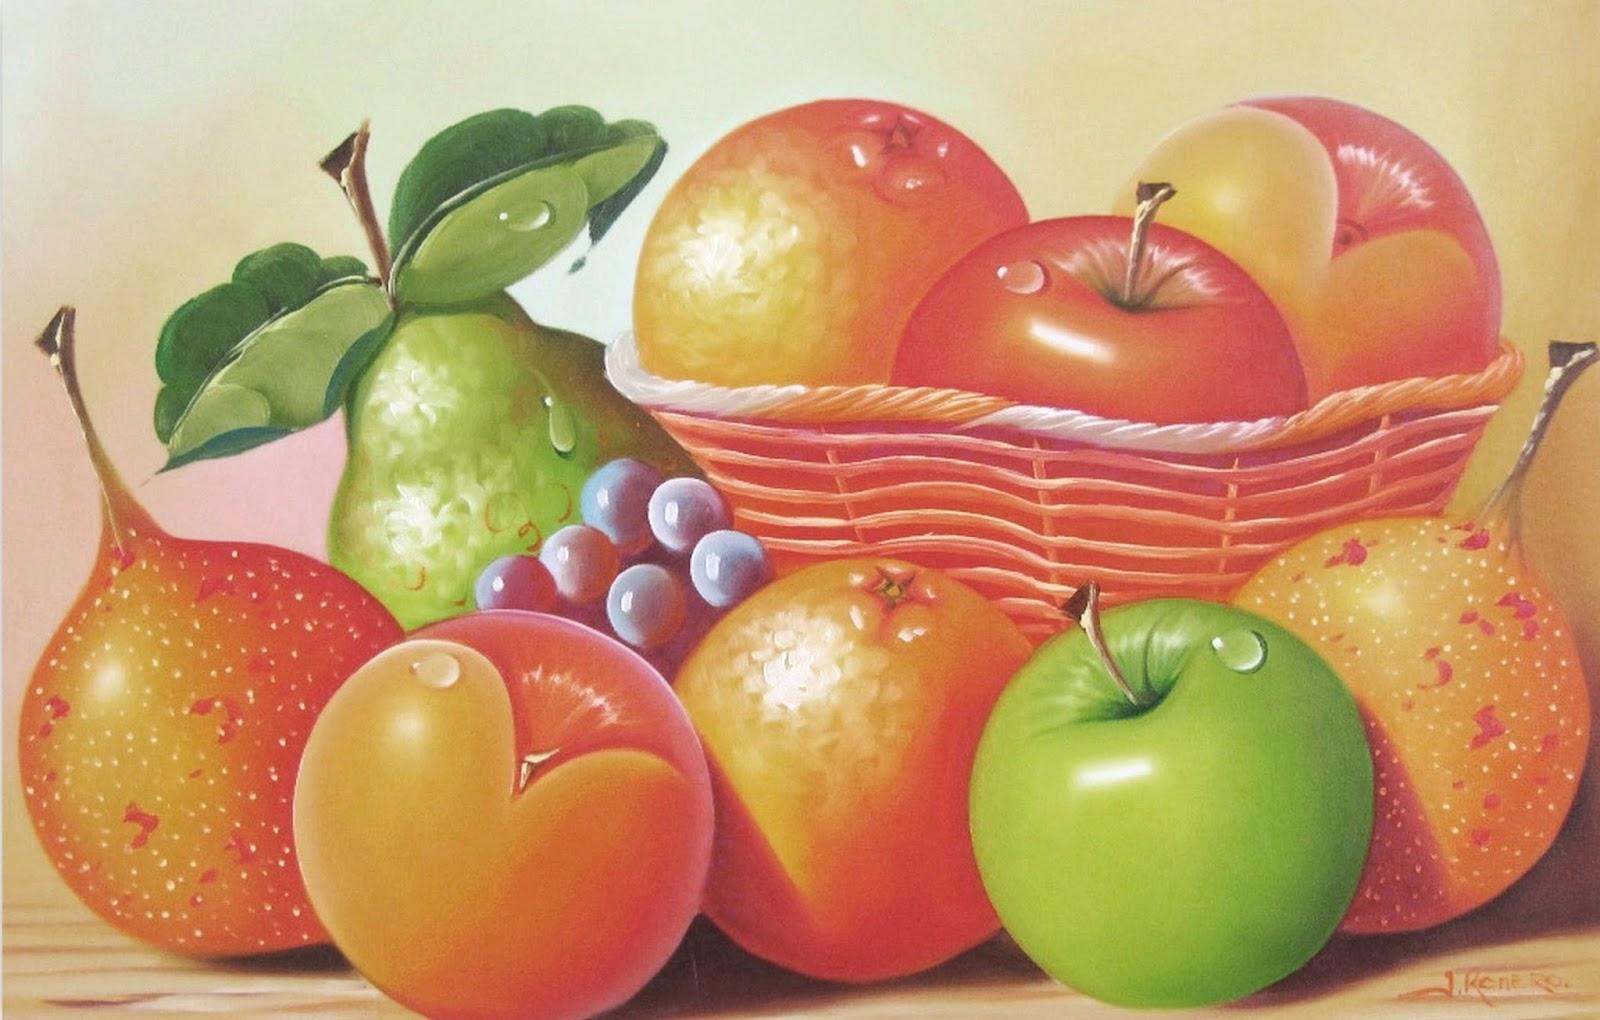 Pintura moderna y fotograf a art stica cuadros de - Fotos de bodegones de frutas ...